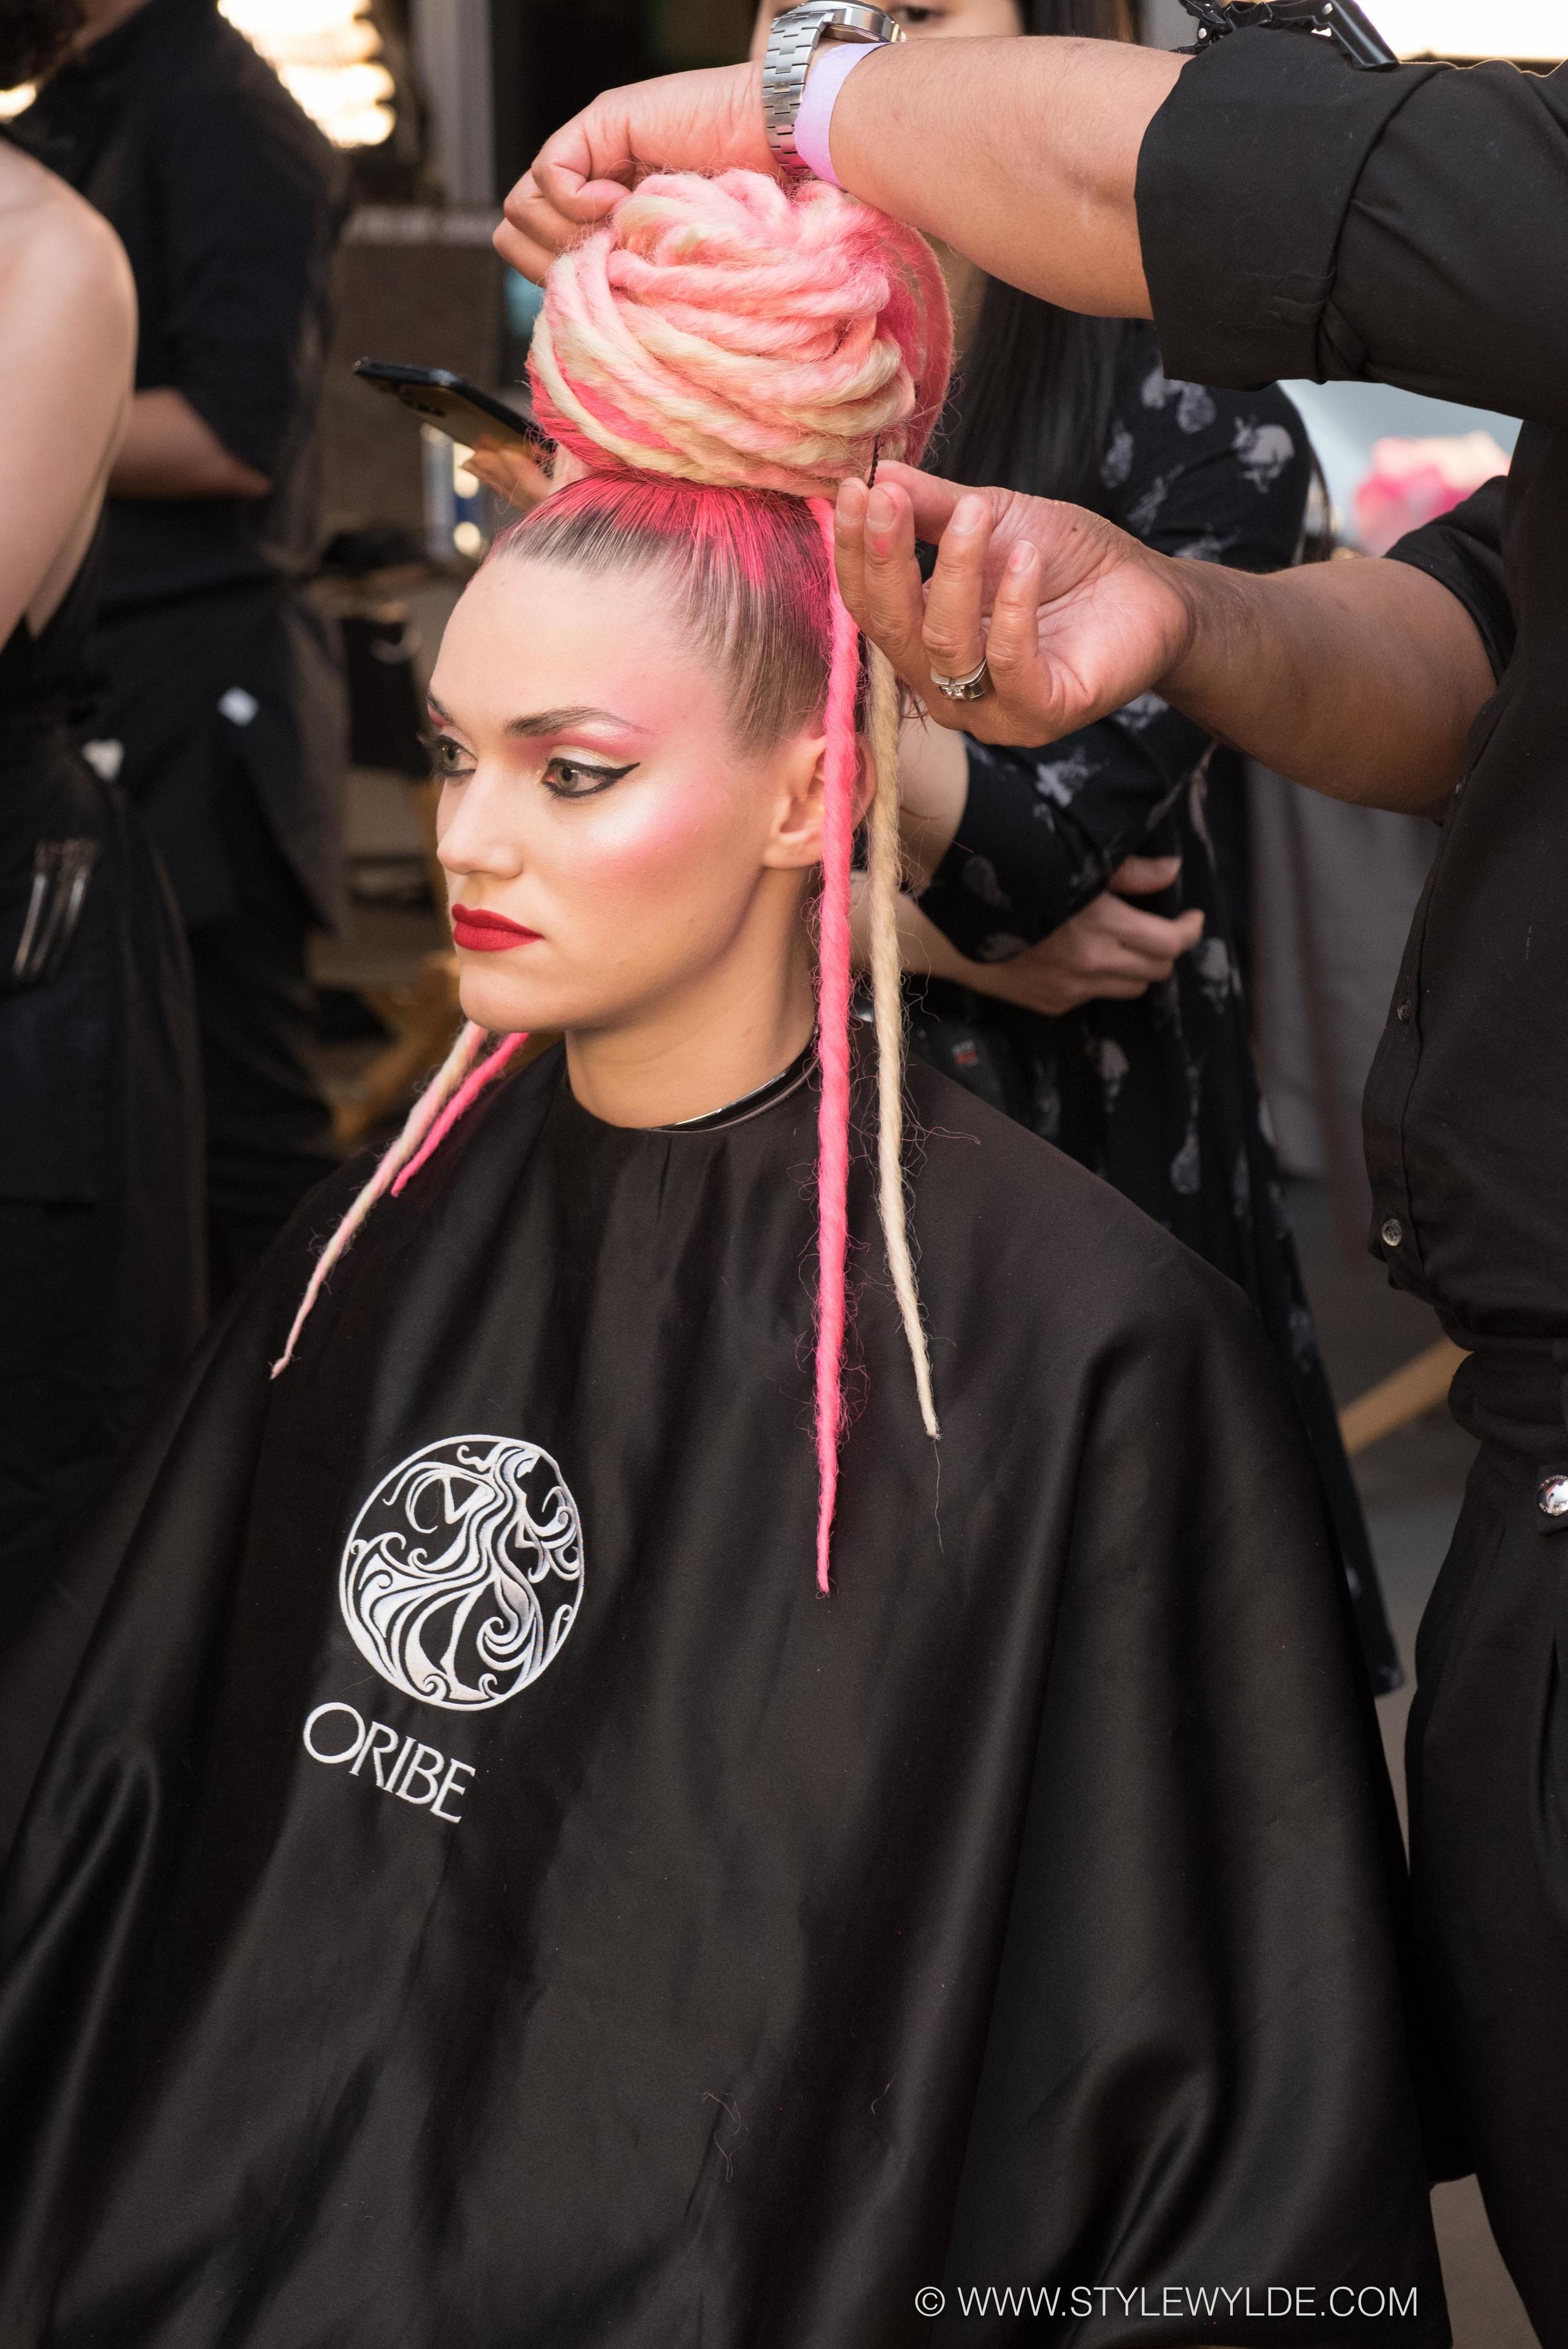 StyleWylde - The blonds- AW16-Bkstg-11.jpg